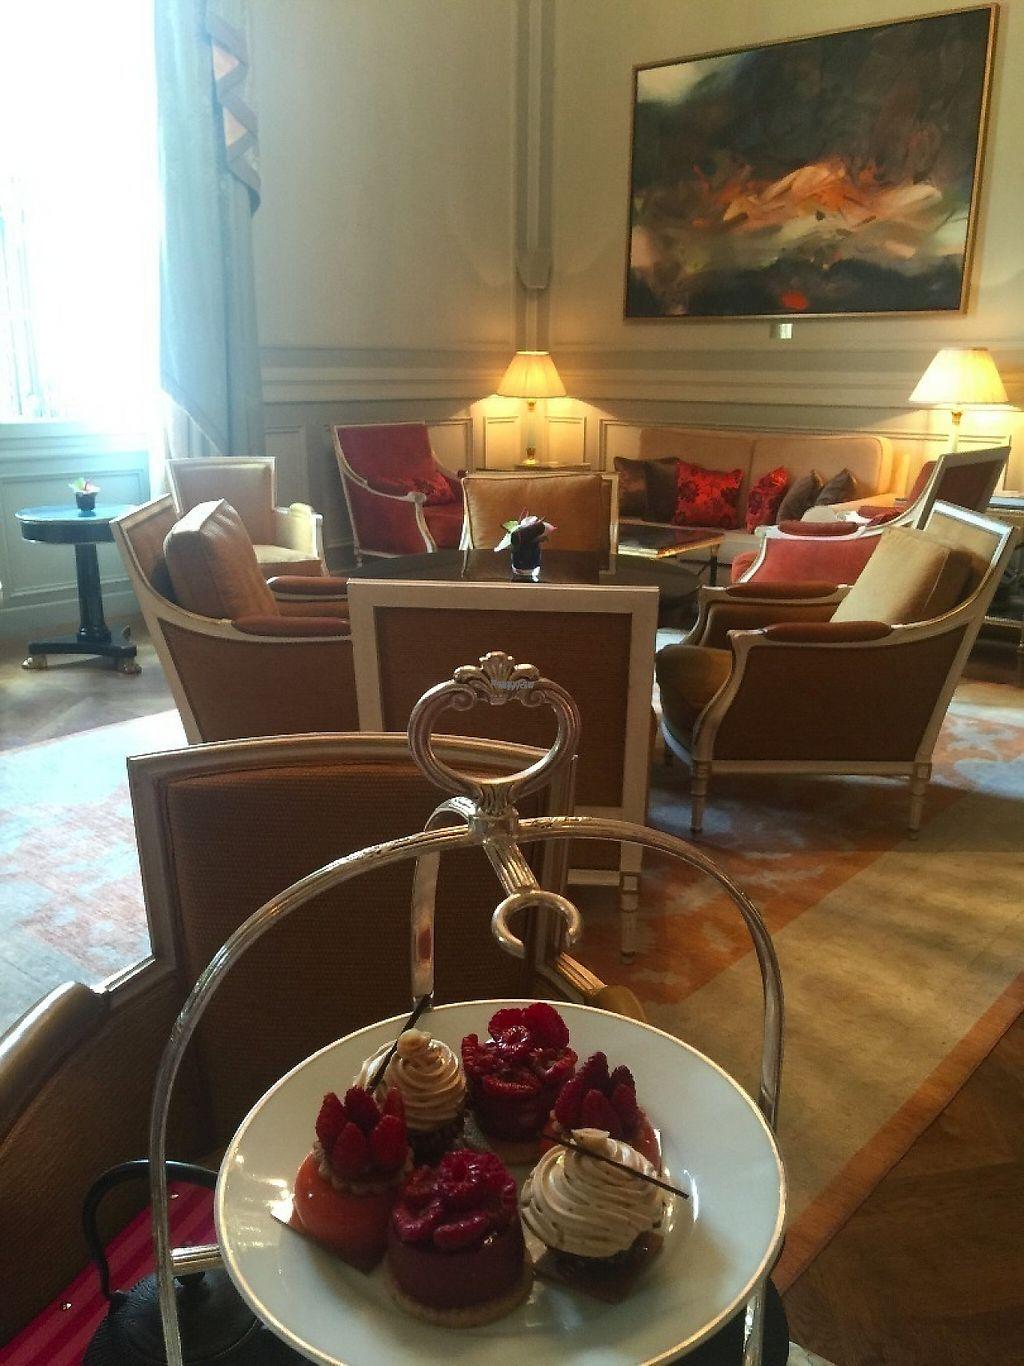 "Photo of Shangri-La Hotel - lounge  by <a href=""/members/profile/Anne%20VDH"">Anne VDH</a> <br/>Vegan high tea; Paris; Shangri-La <br/> January 16, 2017  - <a href='/contact/abuse/image/64090/212358'>Report</a>"